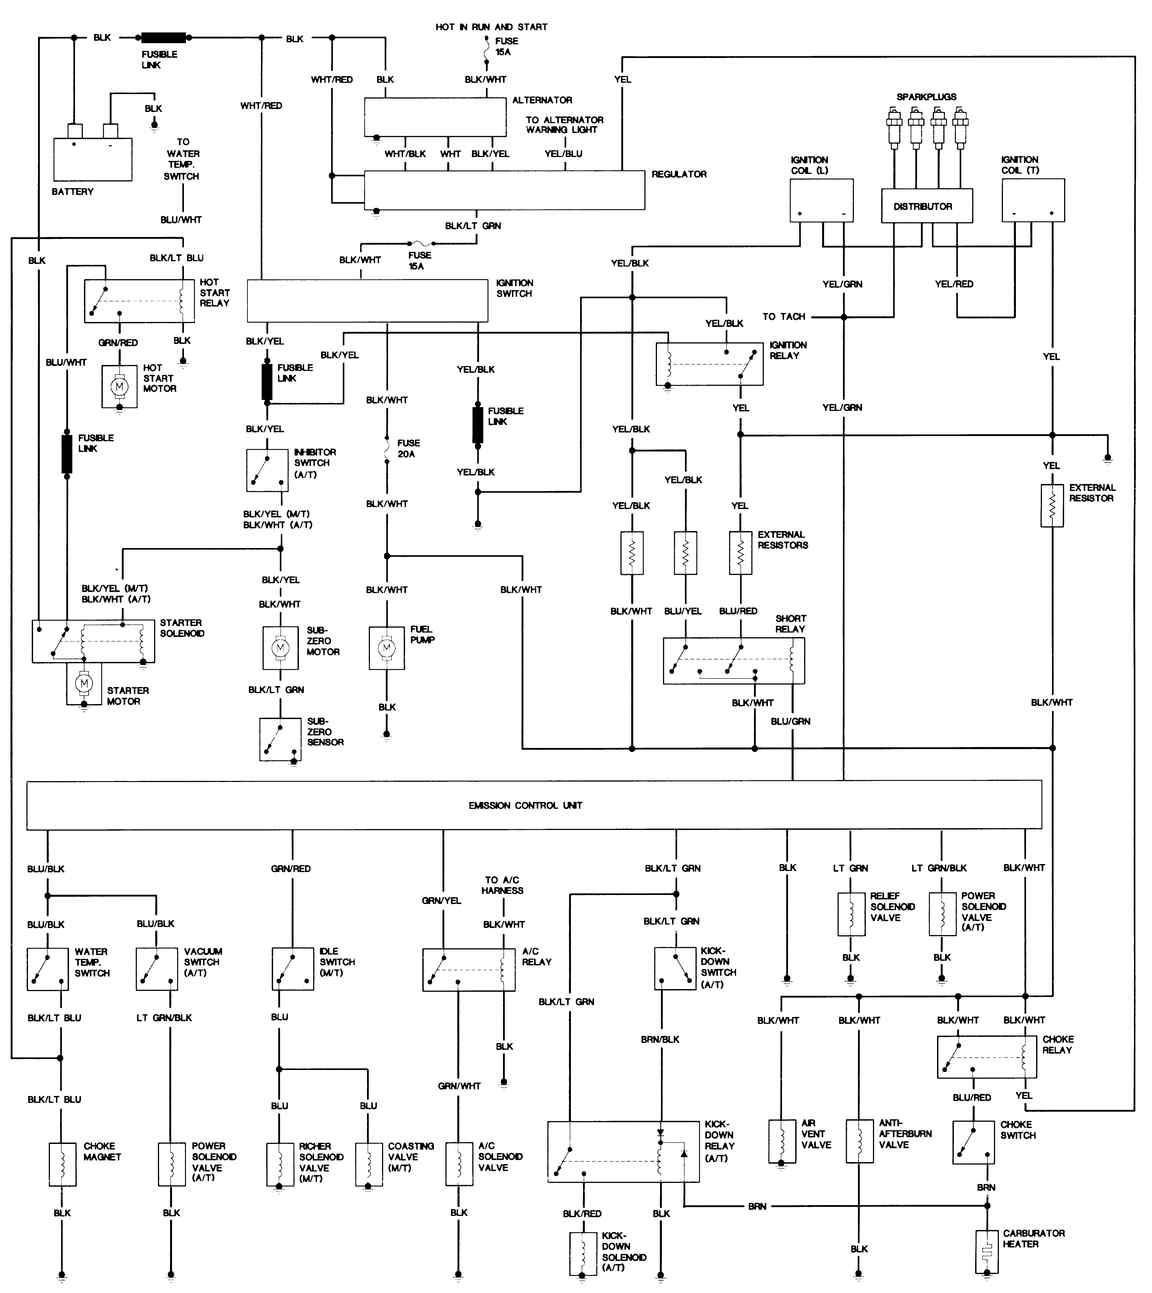 1983 mazda 626 motor diagram wiring library